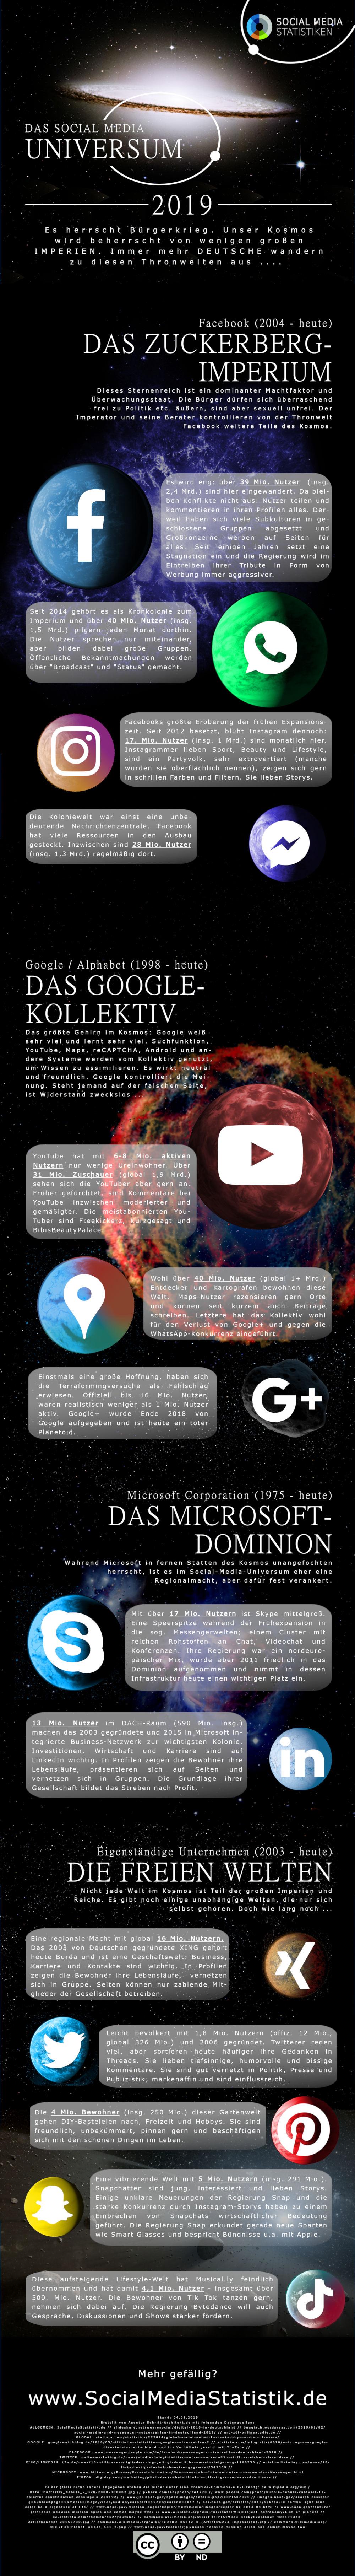 Infografik SocialMediaUniverse2019_1000_052019